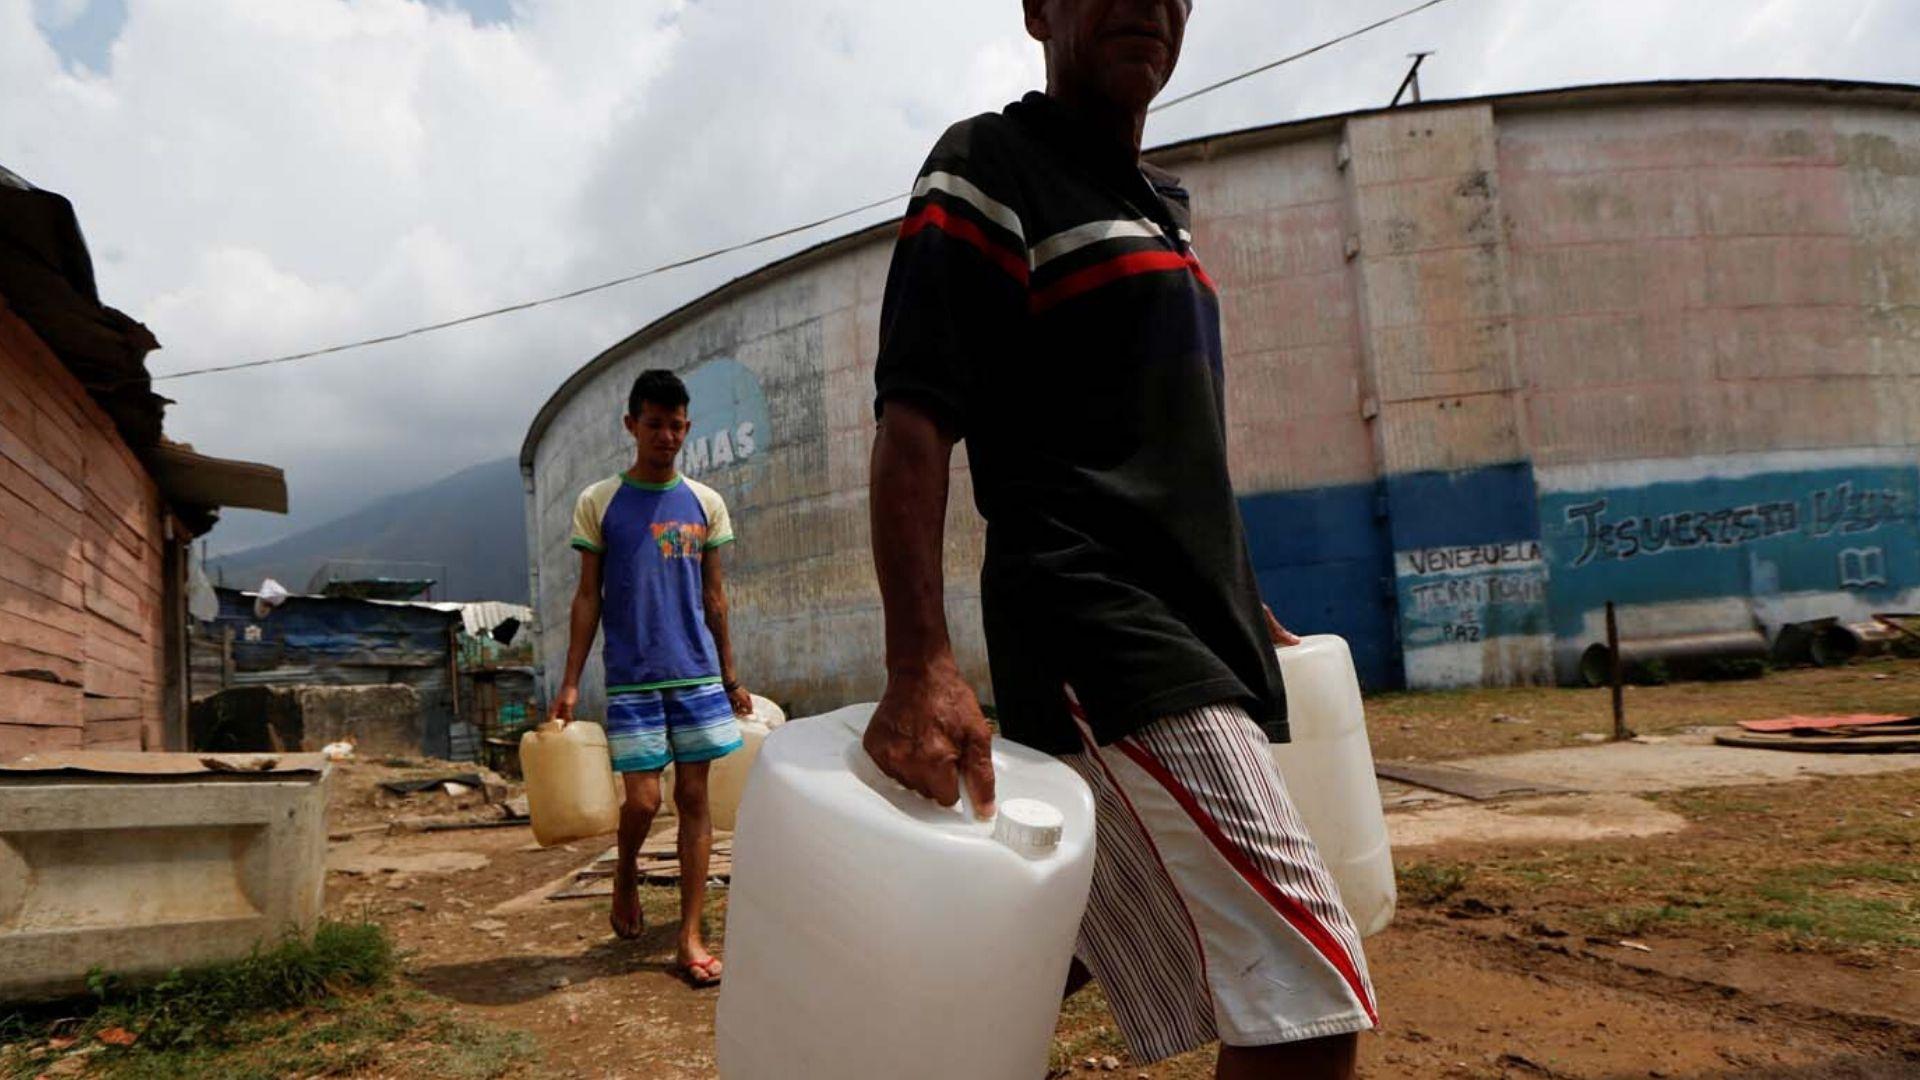 9 de cada 10 hogares venezolanos almacenan agua por fallas en el suministro